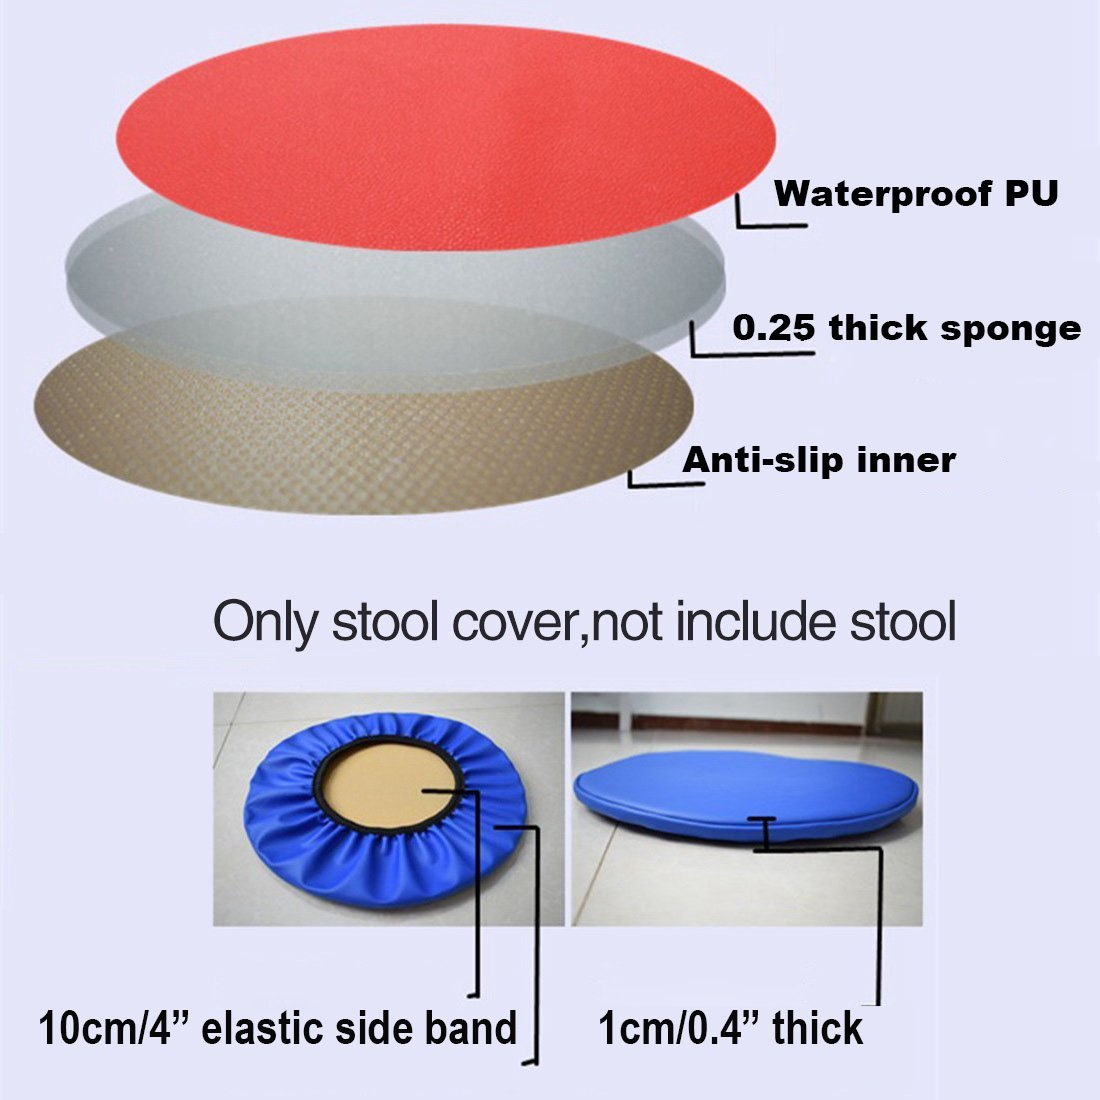 Sigmat 2pc 16 Inch Waterproof Pu Bar Stool Cover Anti Slip